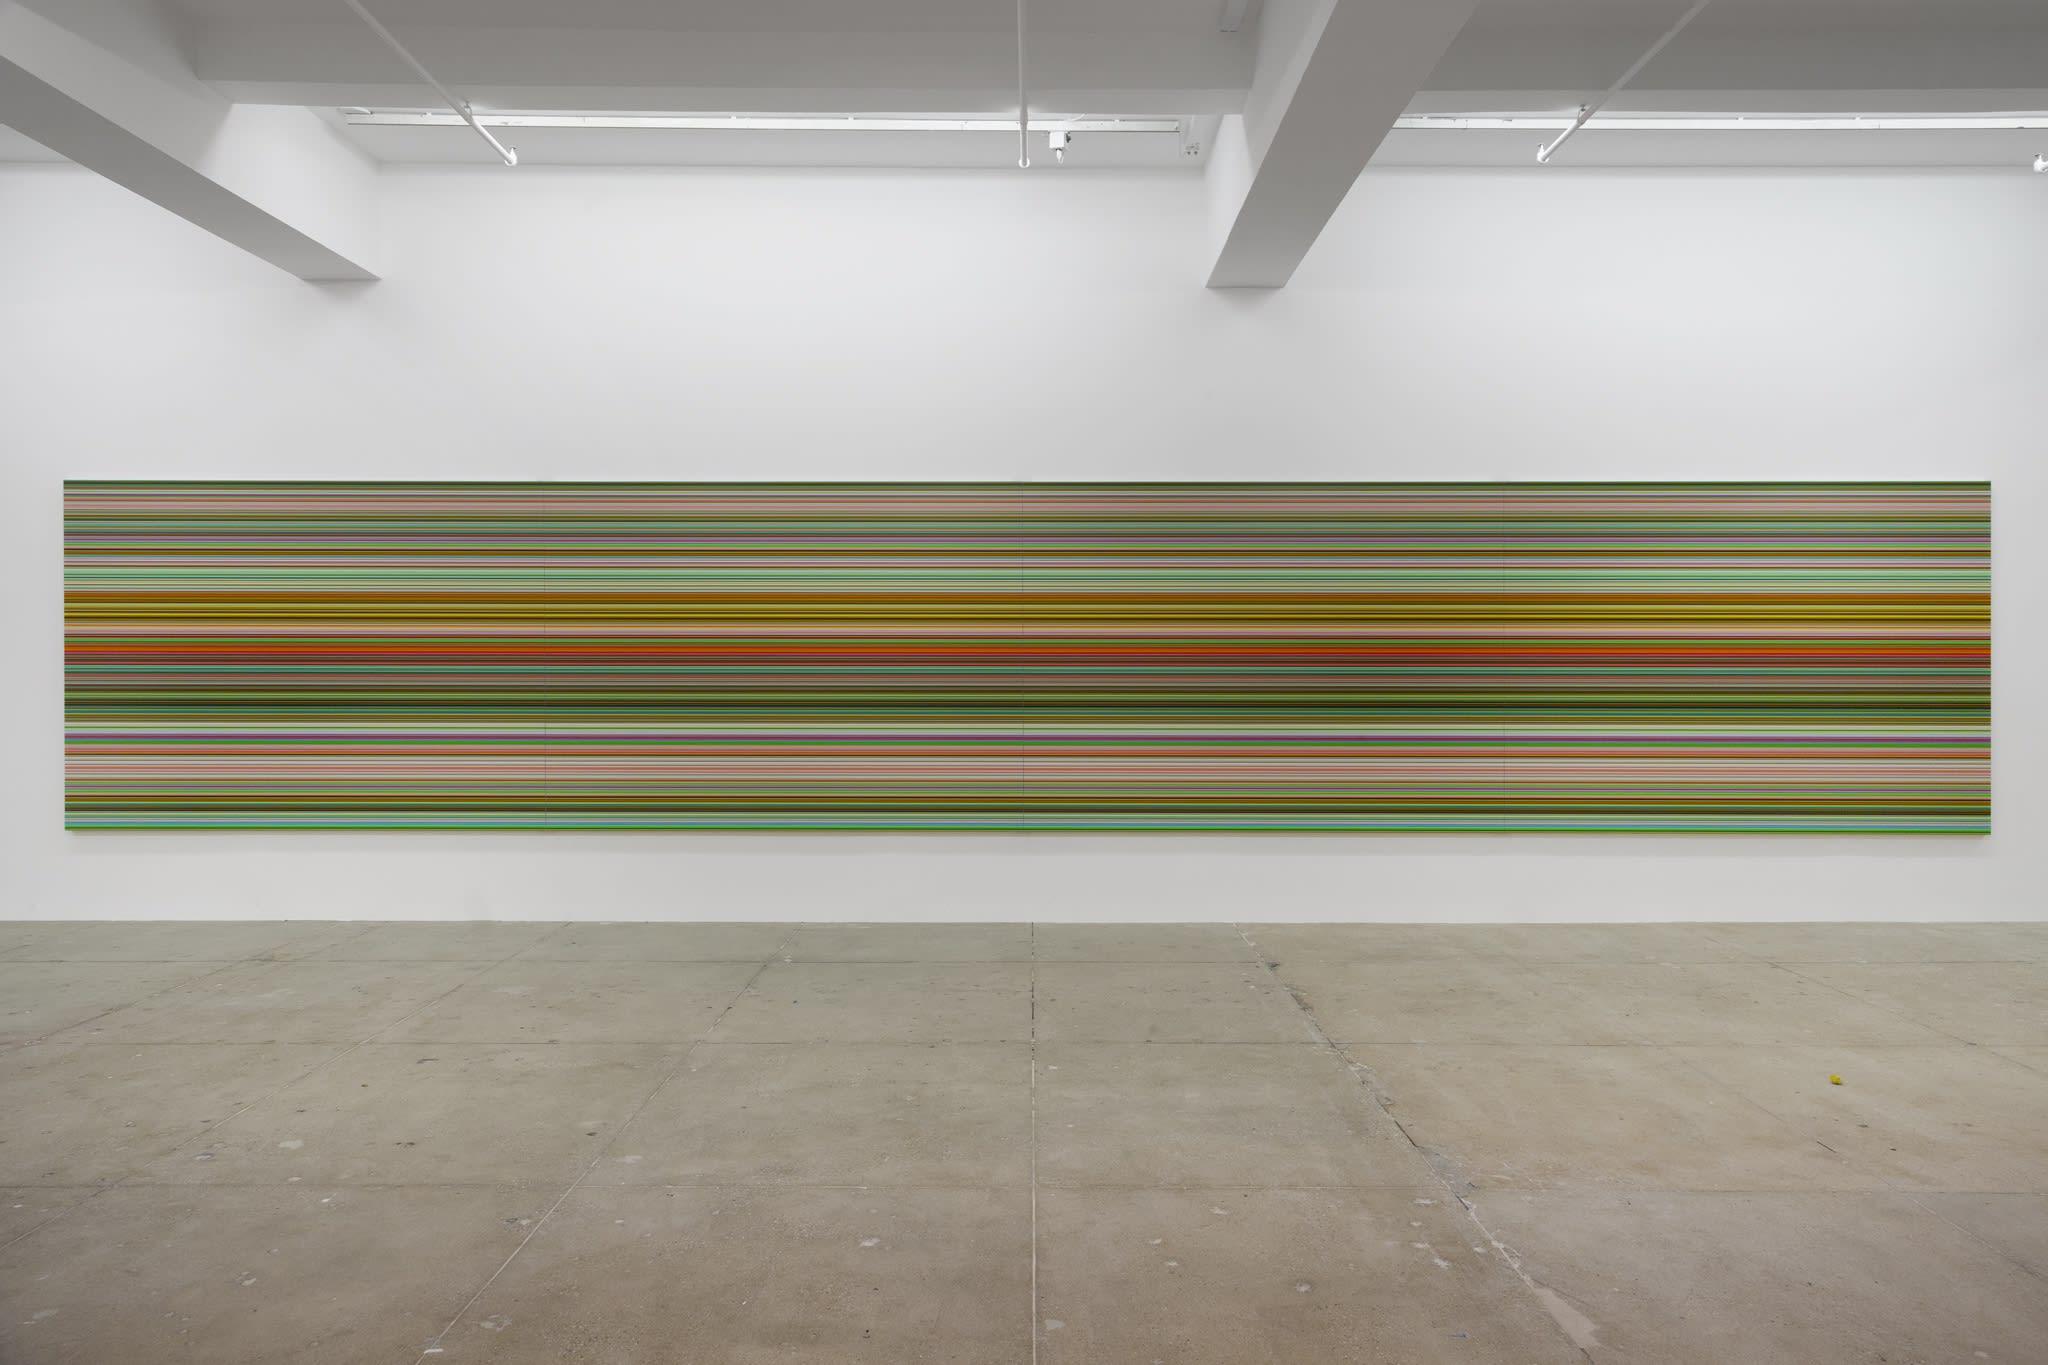 Sol Lewitt, John McCracken, Gerhard Richter, Fred Sandback, Anne Truitt, Lawrence Weiner